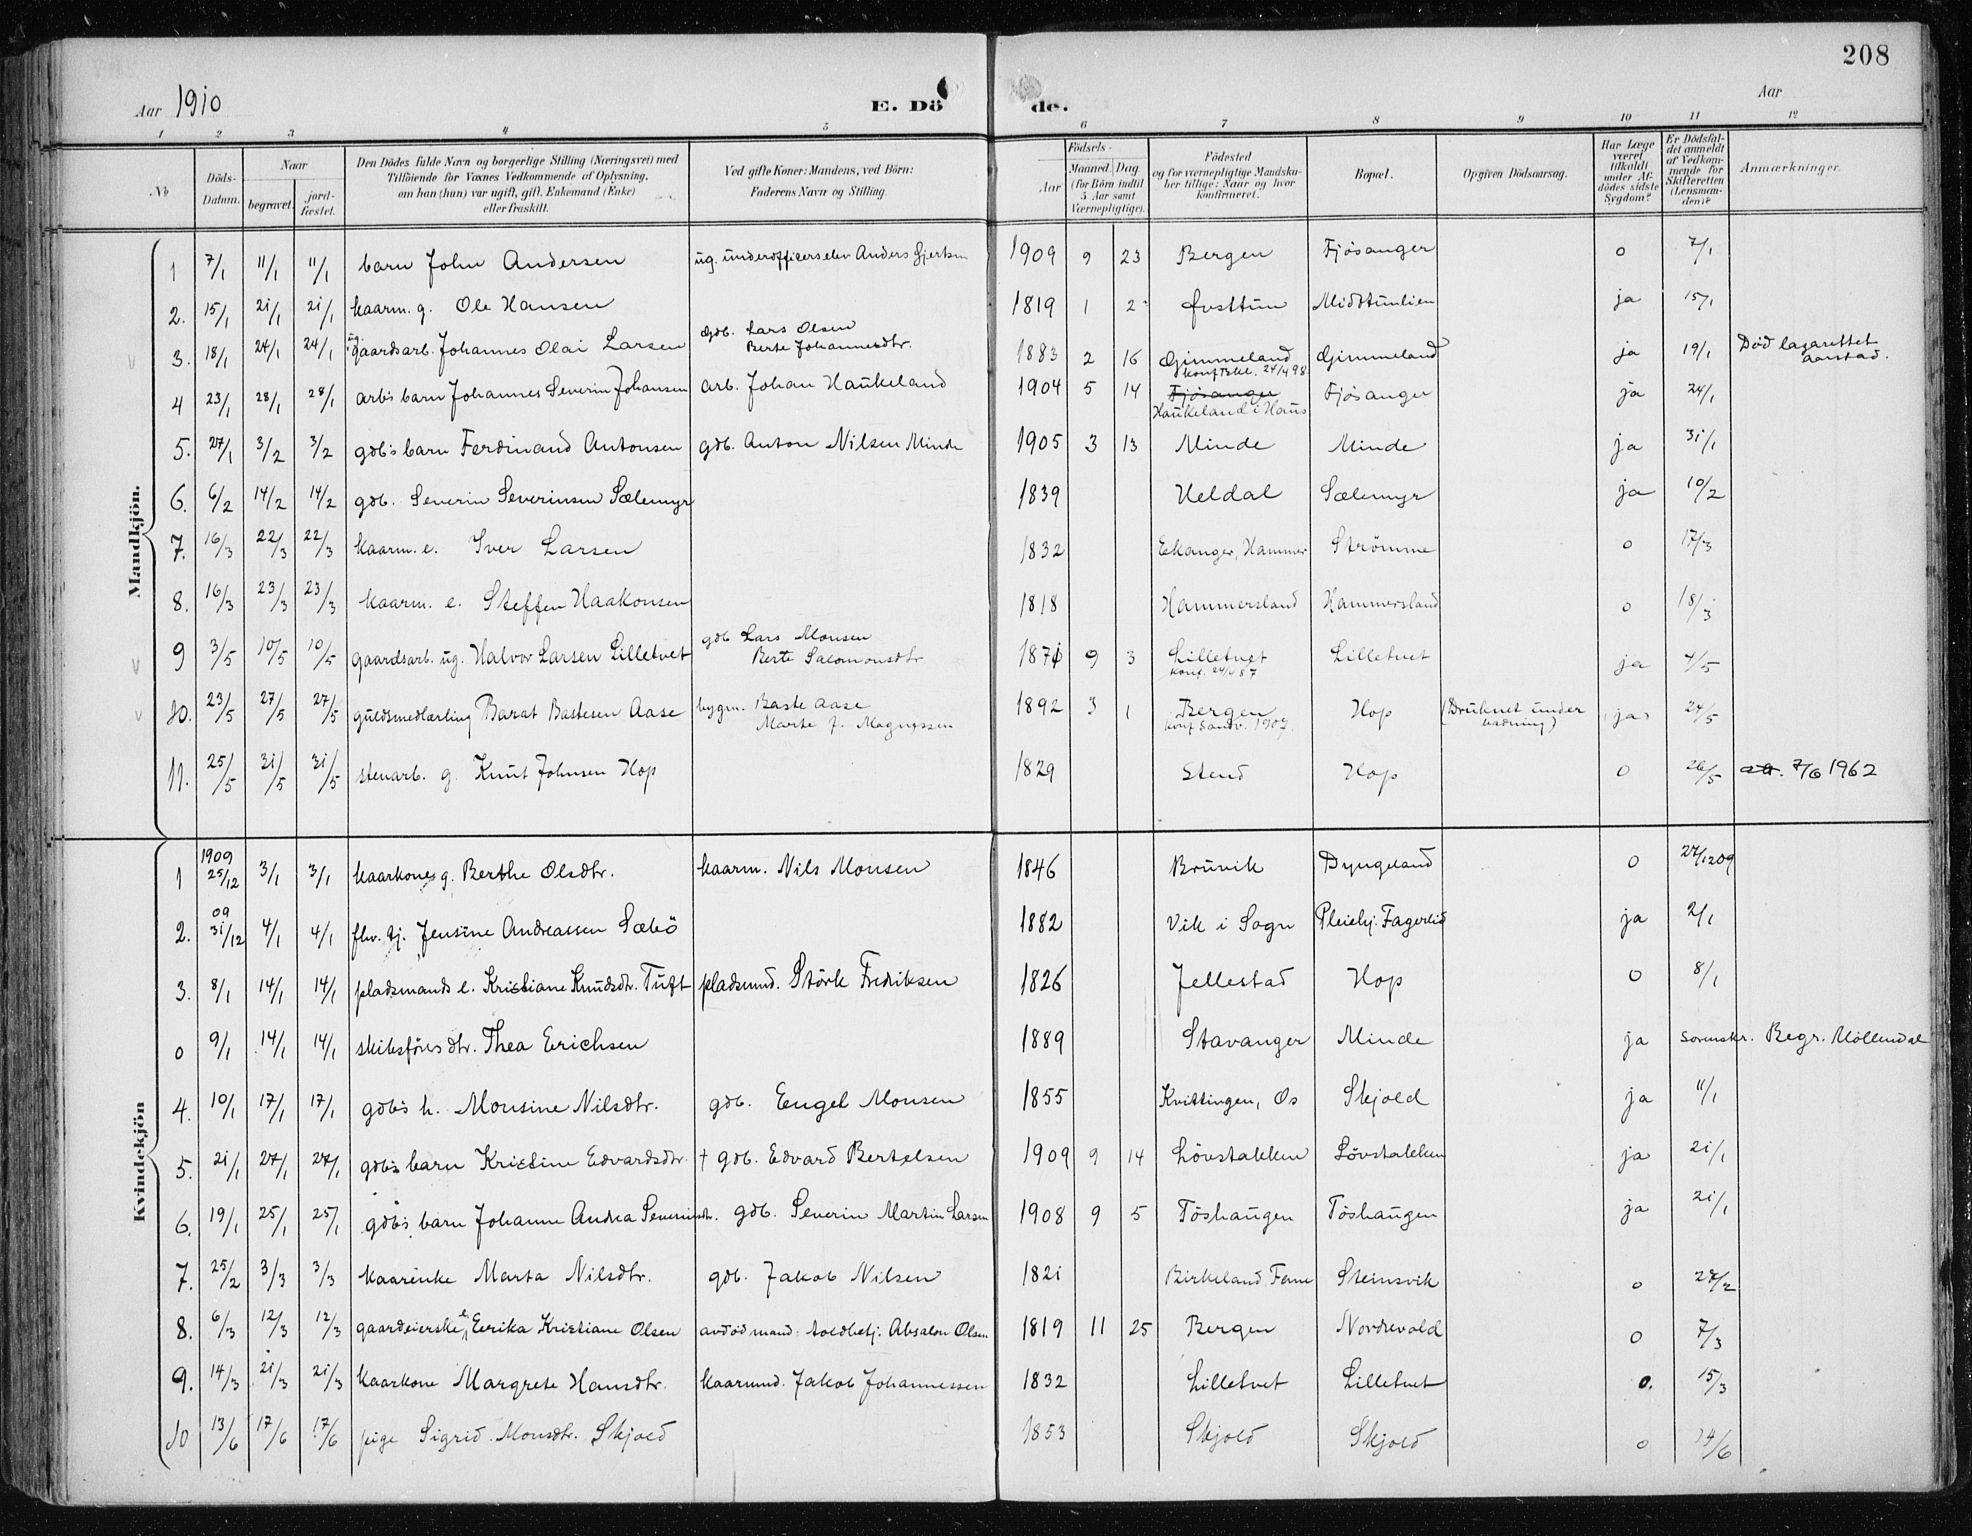 SAB, Fana Sokneprestembete, H/Haa/Haai/L0003: Ministerialbok nr. I 3, 1900-1912, s. 208